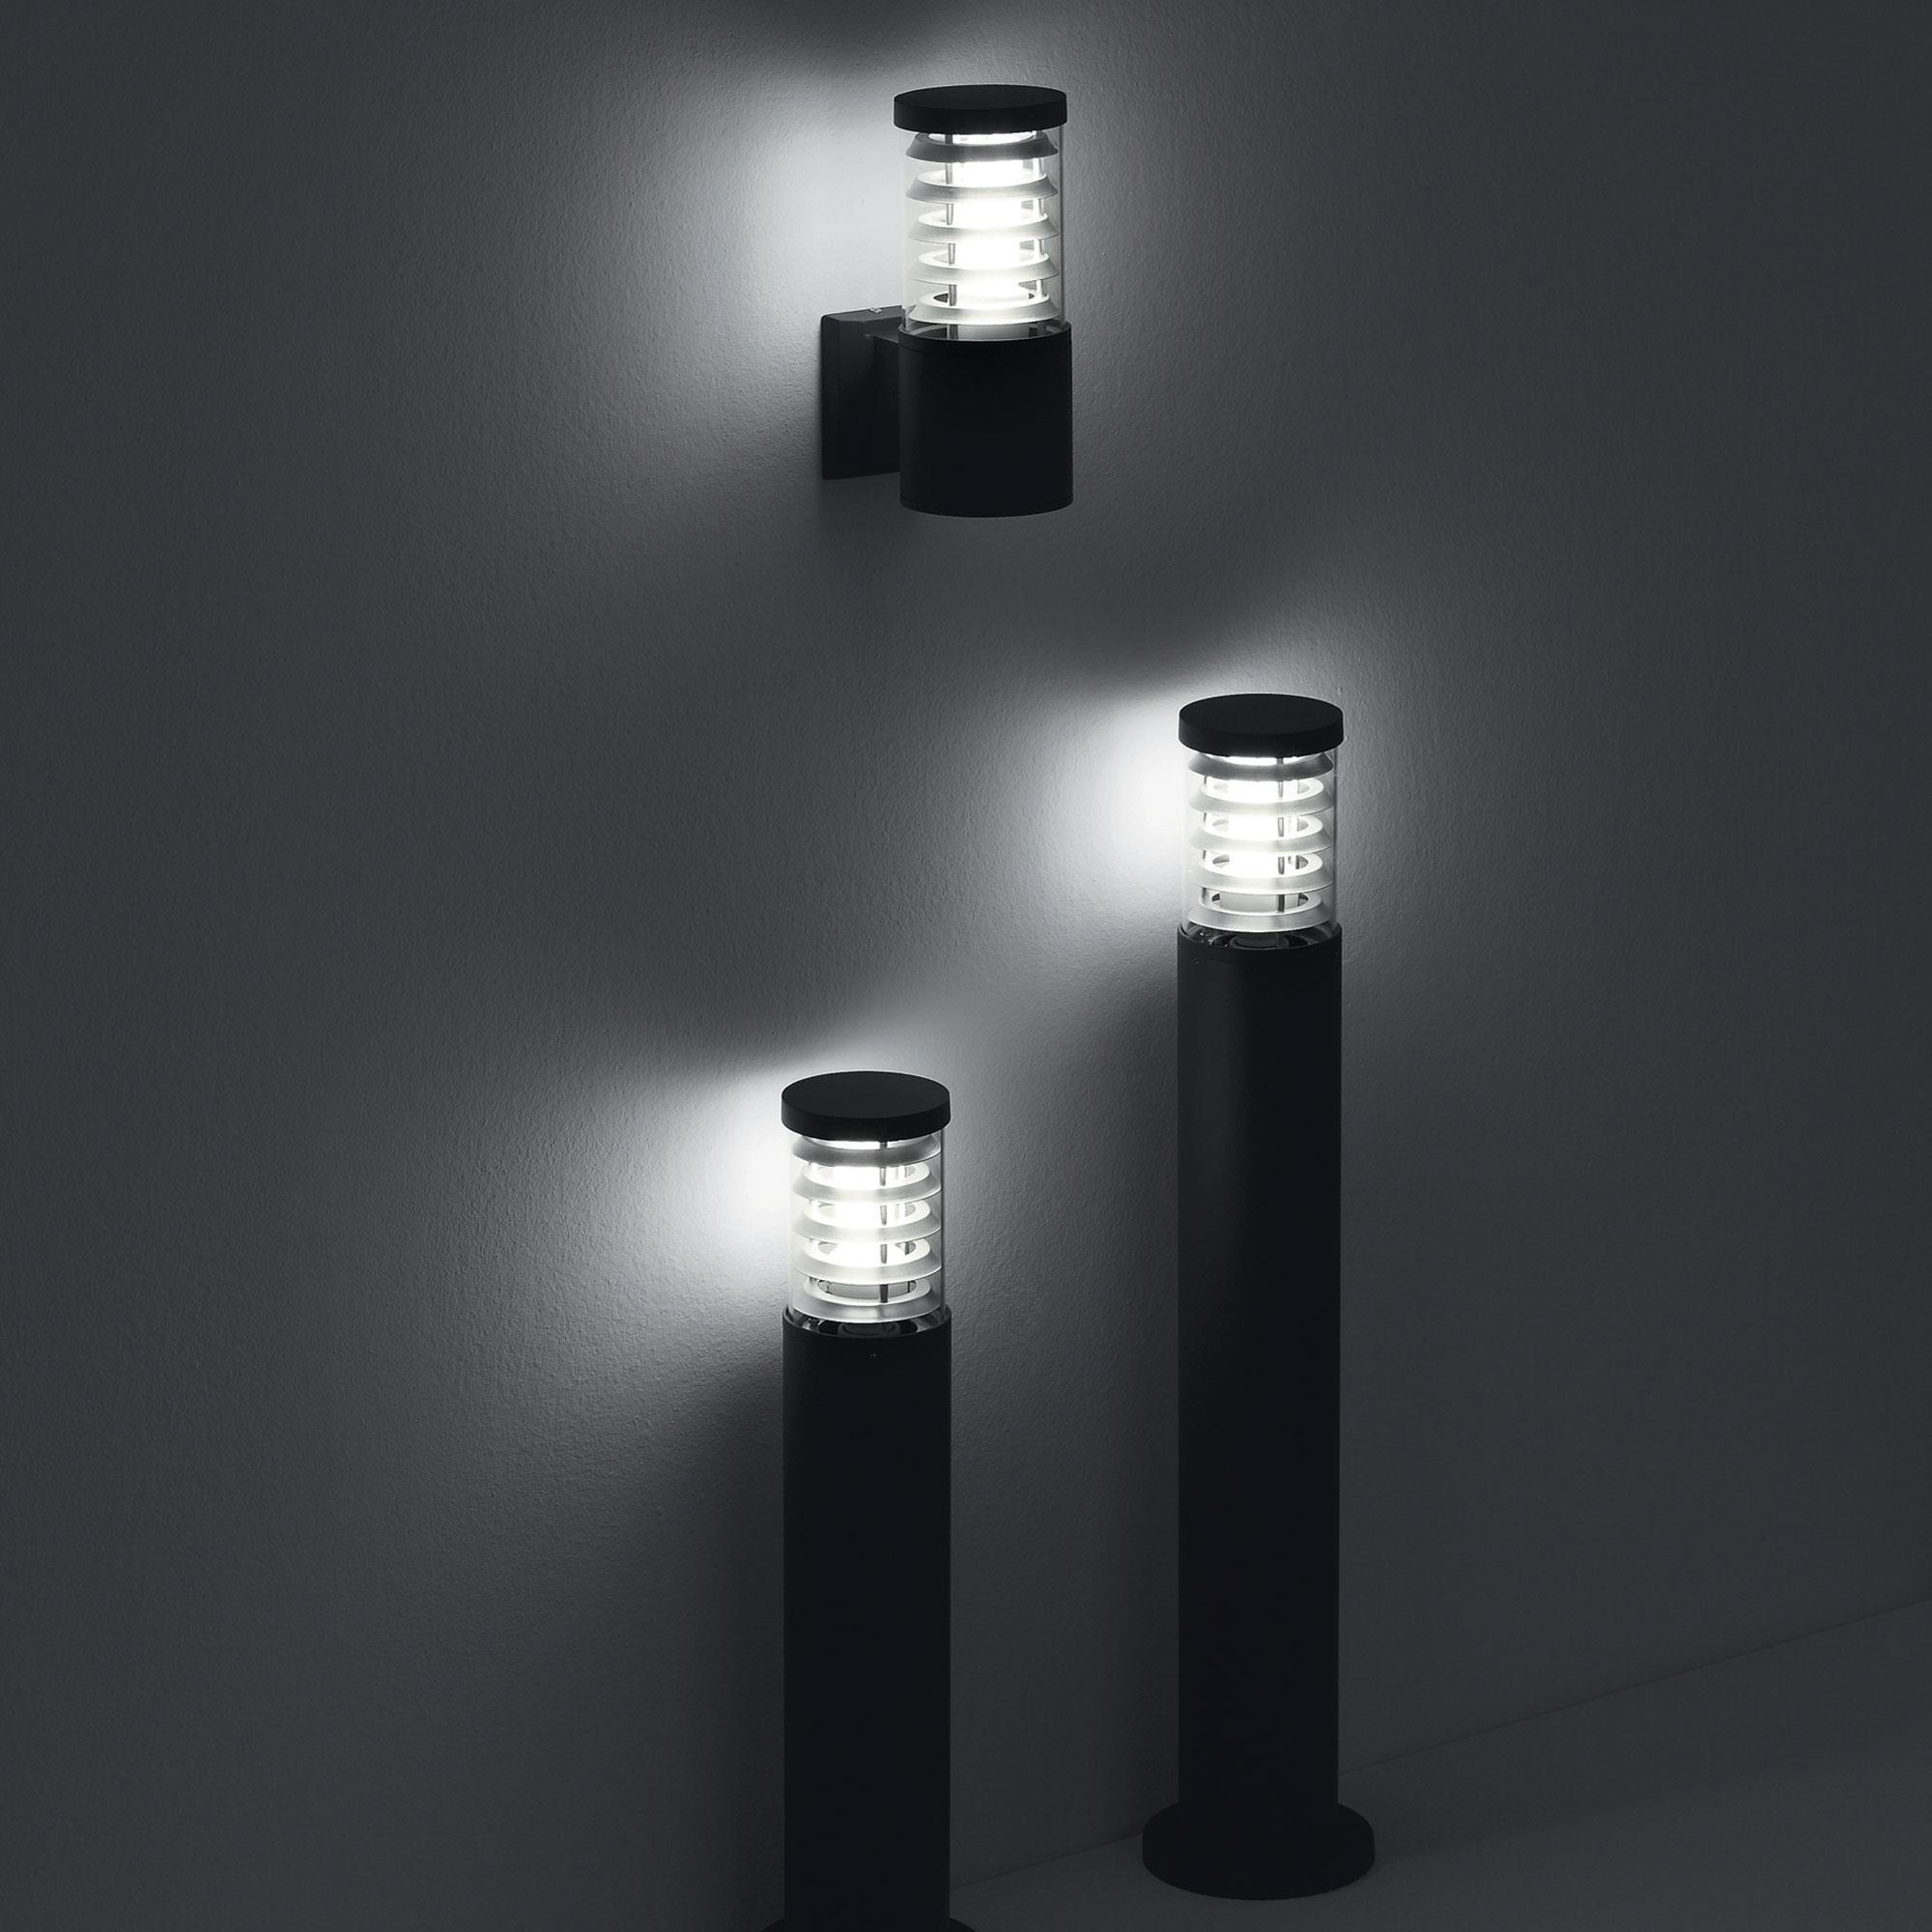 Ideal Lux 026961 Tronco PT1 Big Grigio kültéri állólámpa